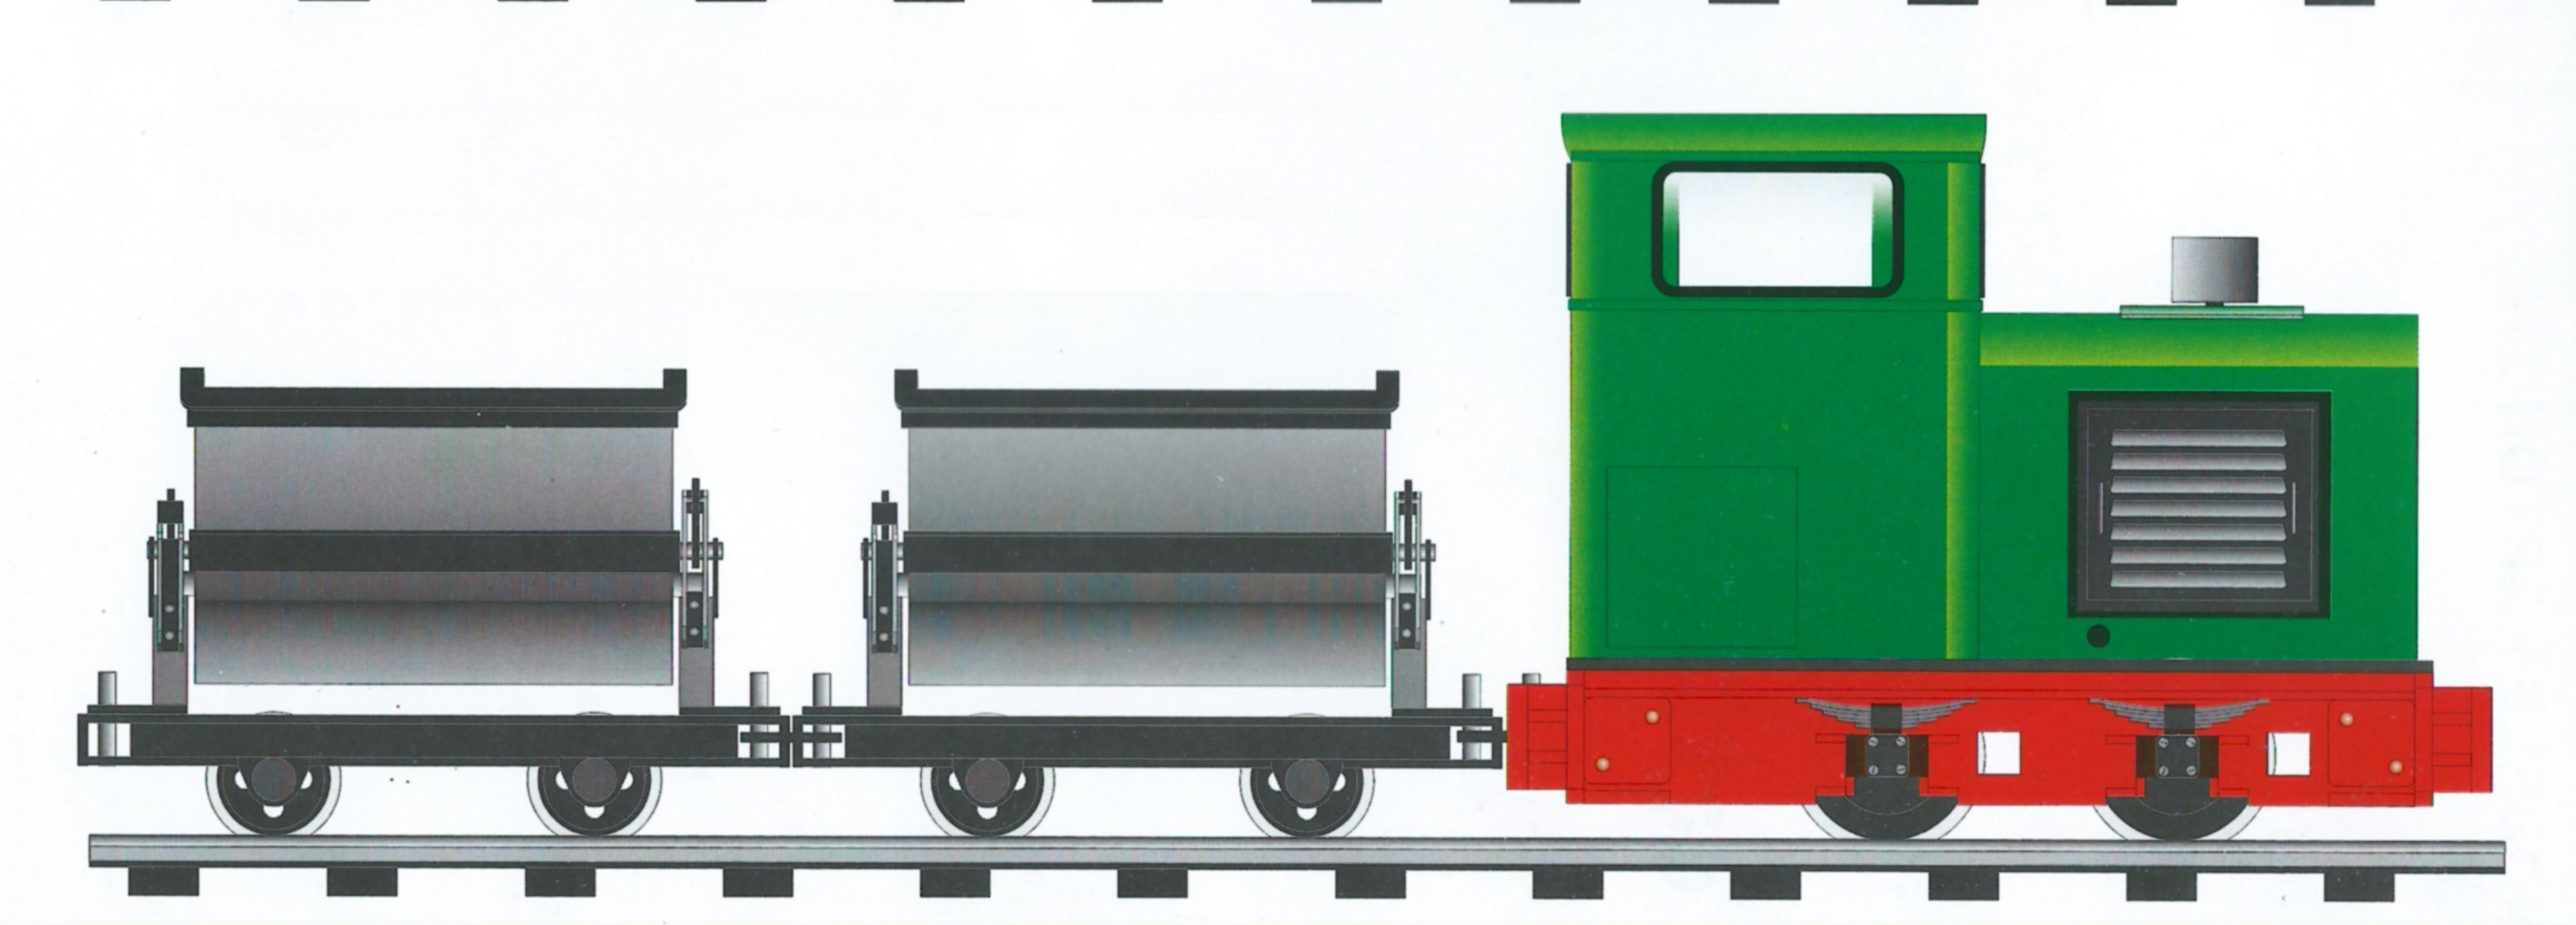 train model paper